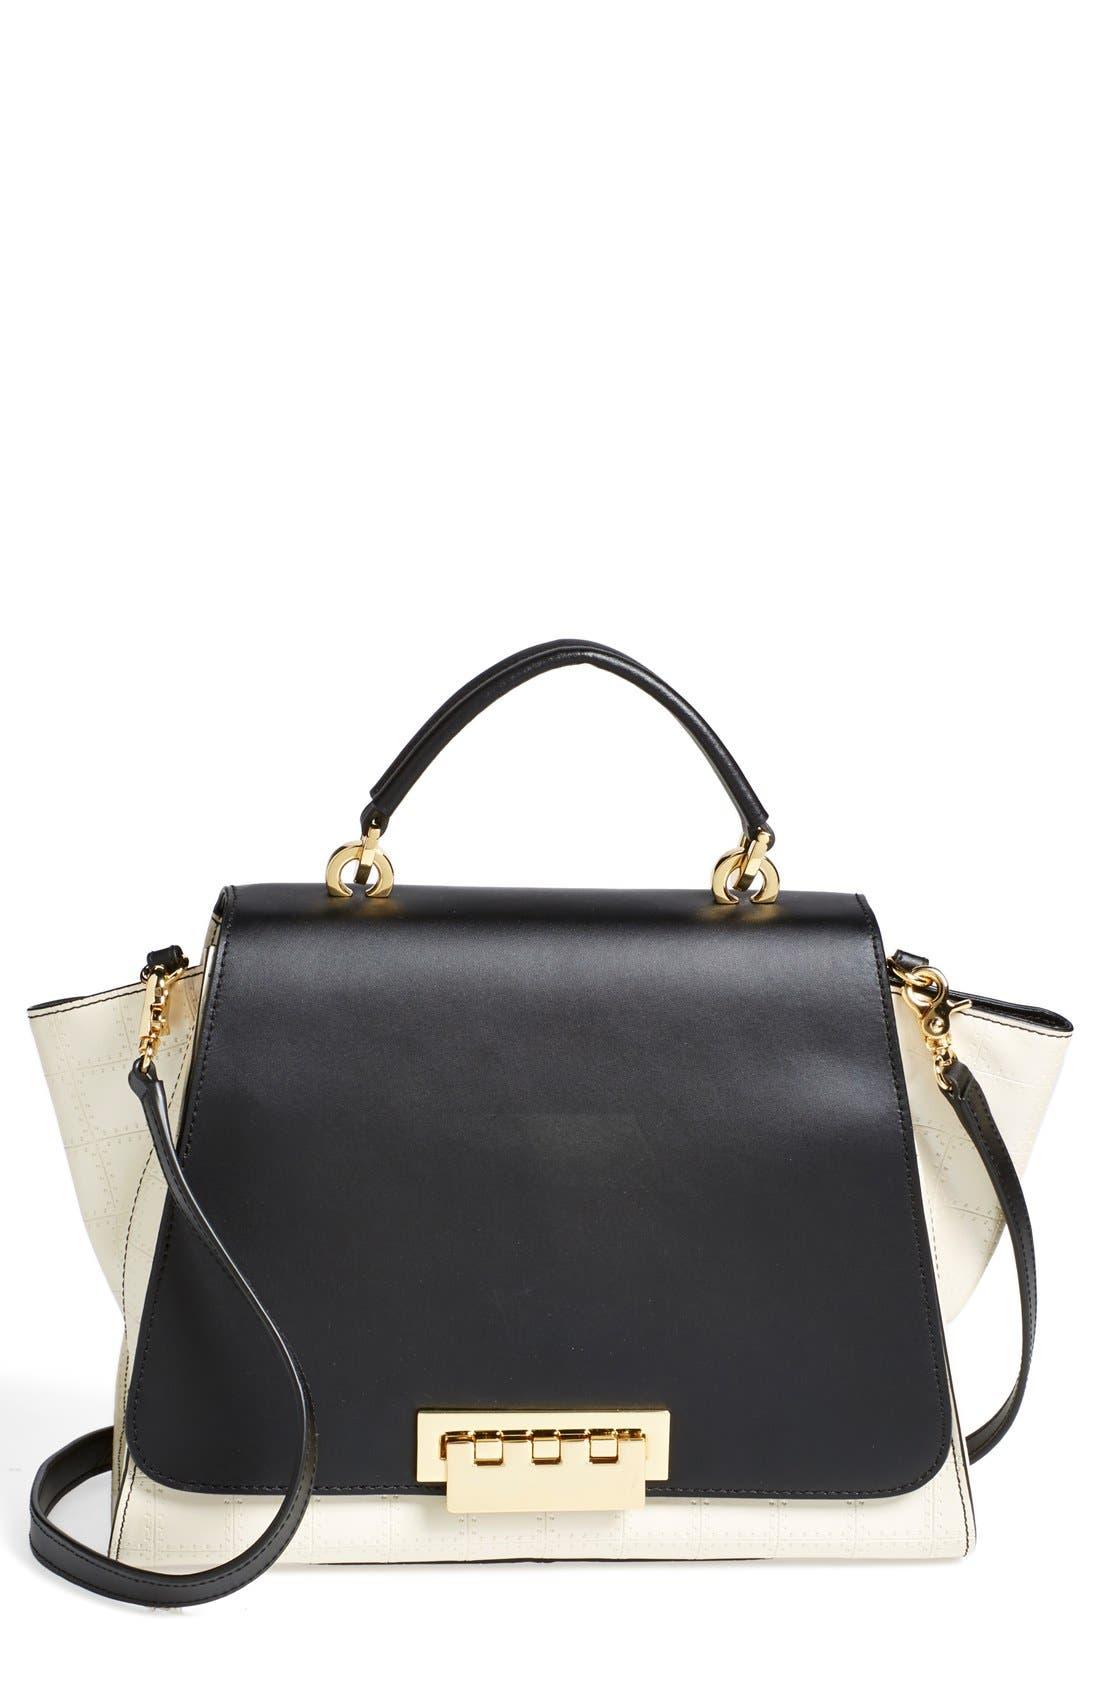 'Eartha' Colorblock Leather Top Handle Satchel, Main, color, 100